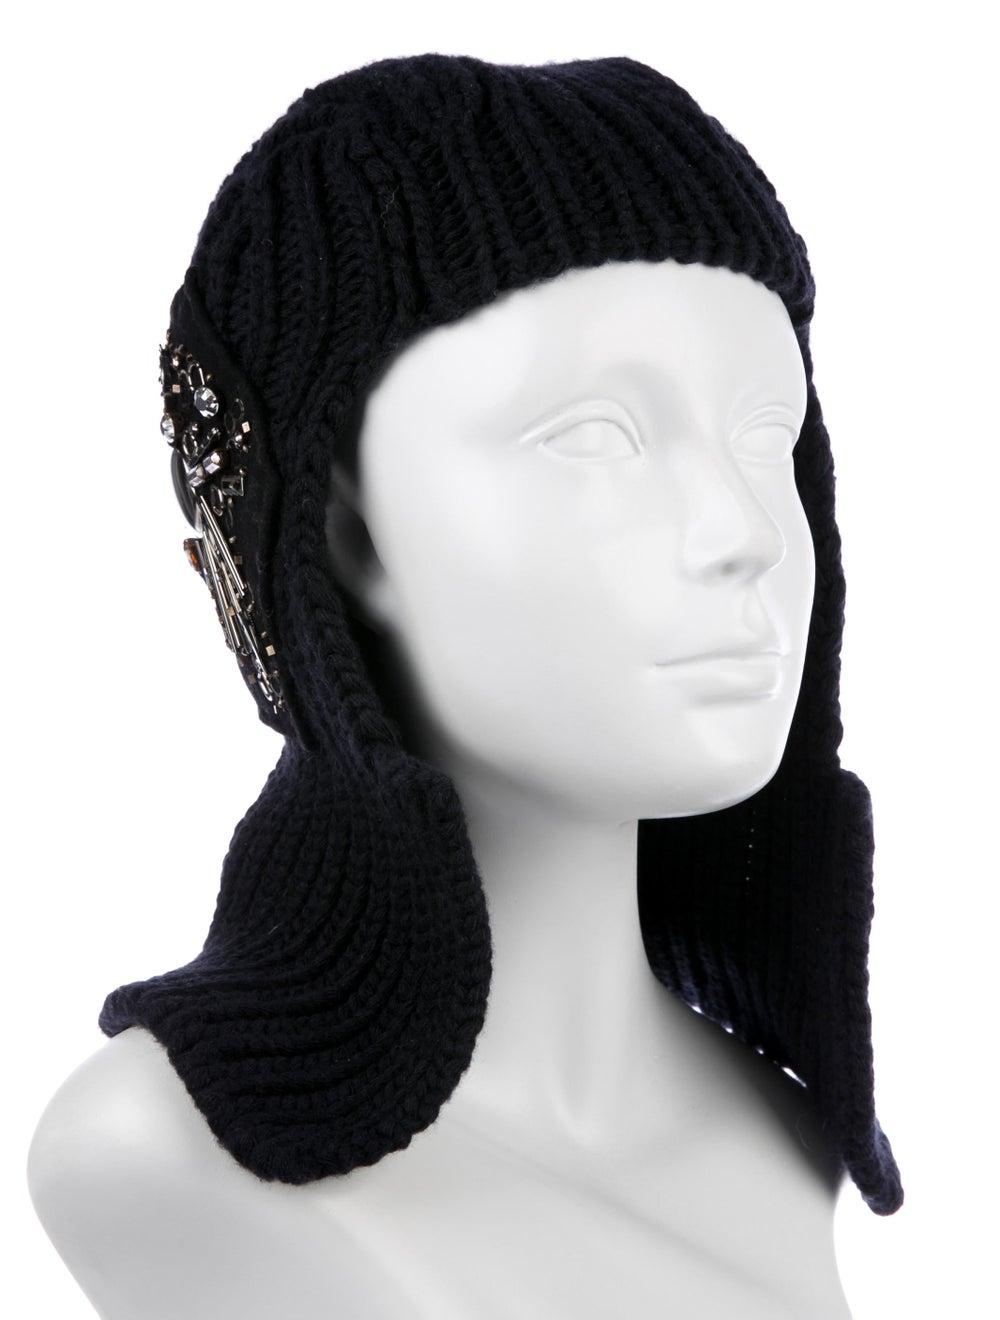 Prada Embellished Wool & Cashmere-Blend Balaclava… - image 3